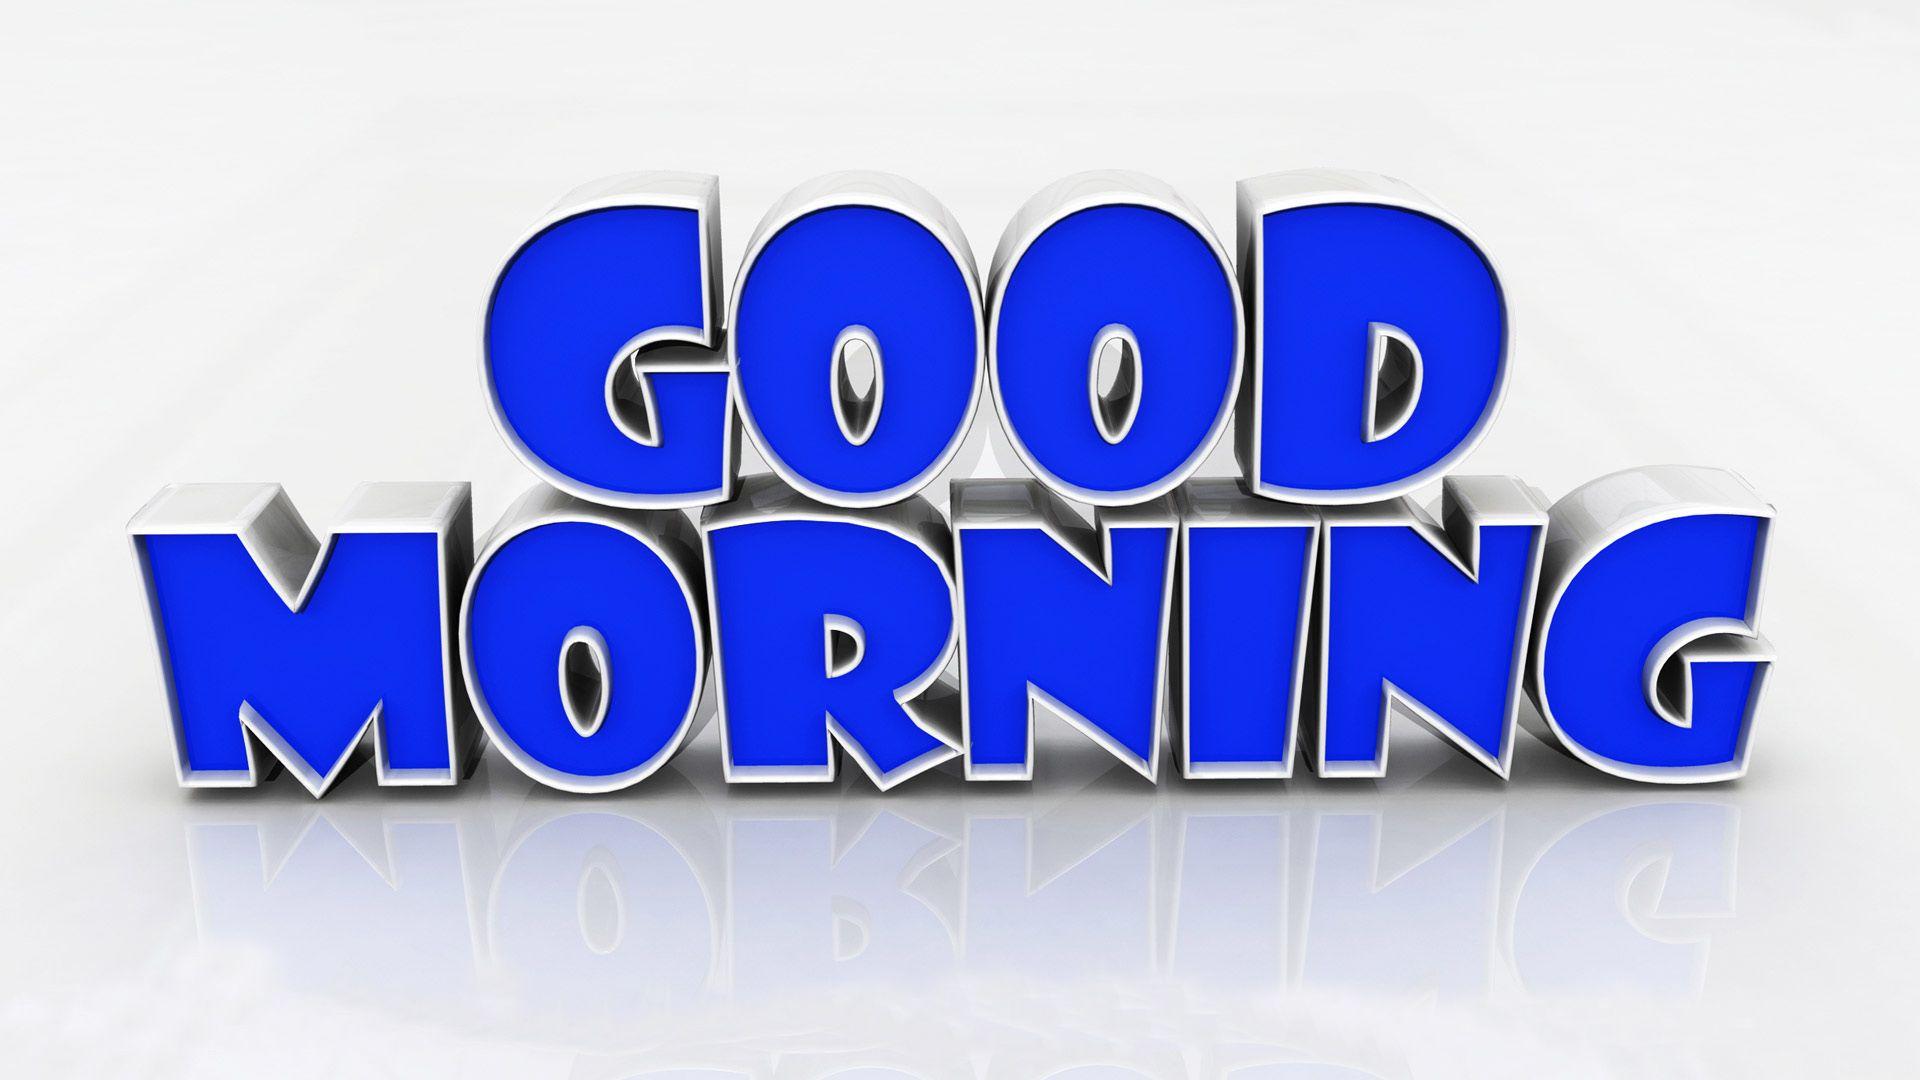 Good Morning 3d Hd Wallpapers Jpg 1920 1080 Good Morning Wishes Good Morning Greeting Cards Good Morning Images Hd